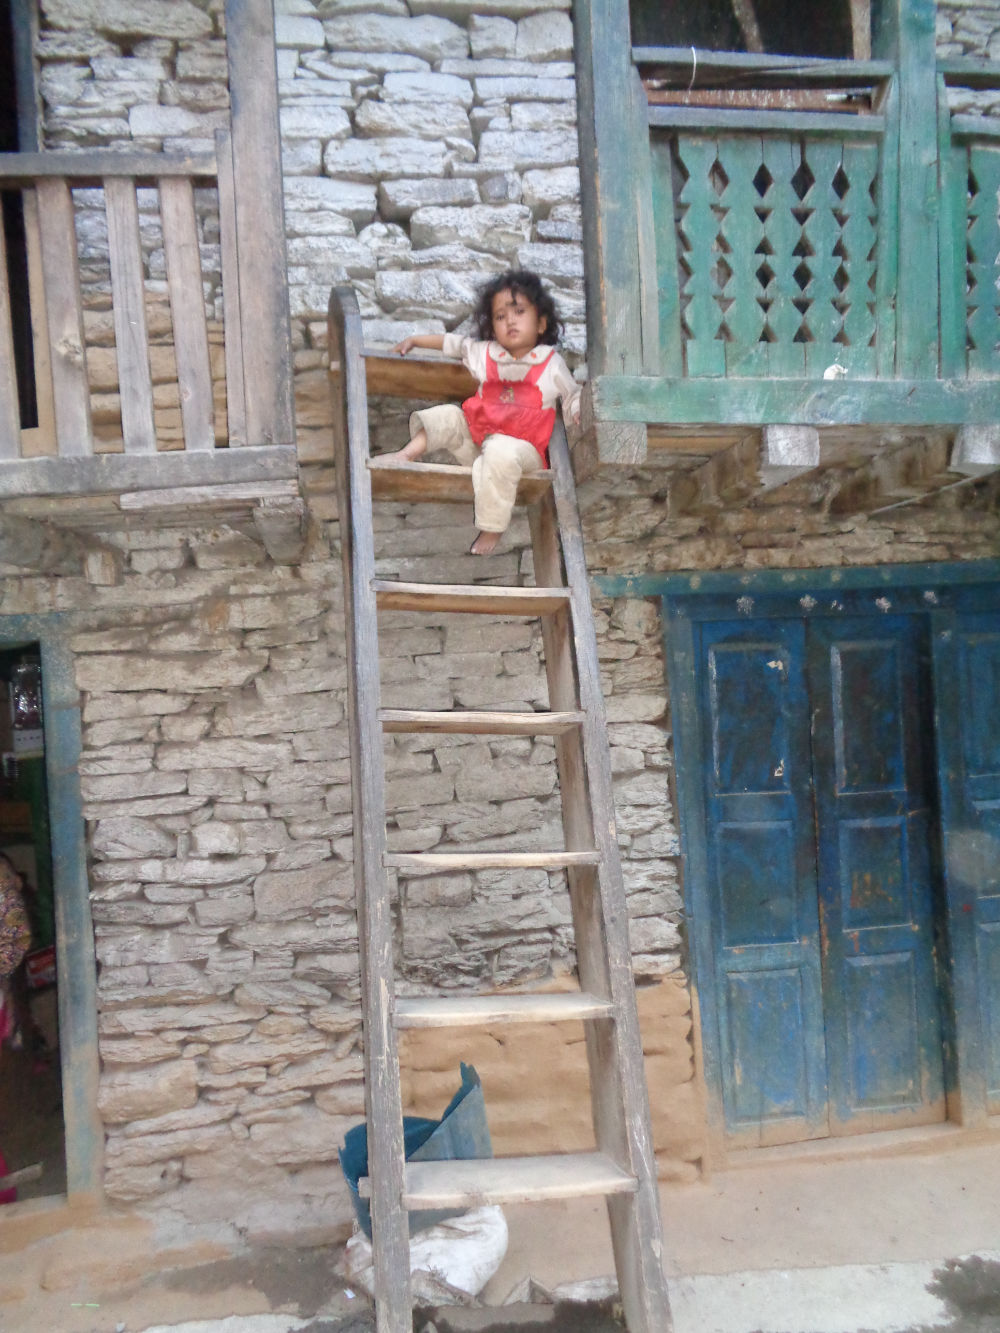 Unaccompanied young child on ladder